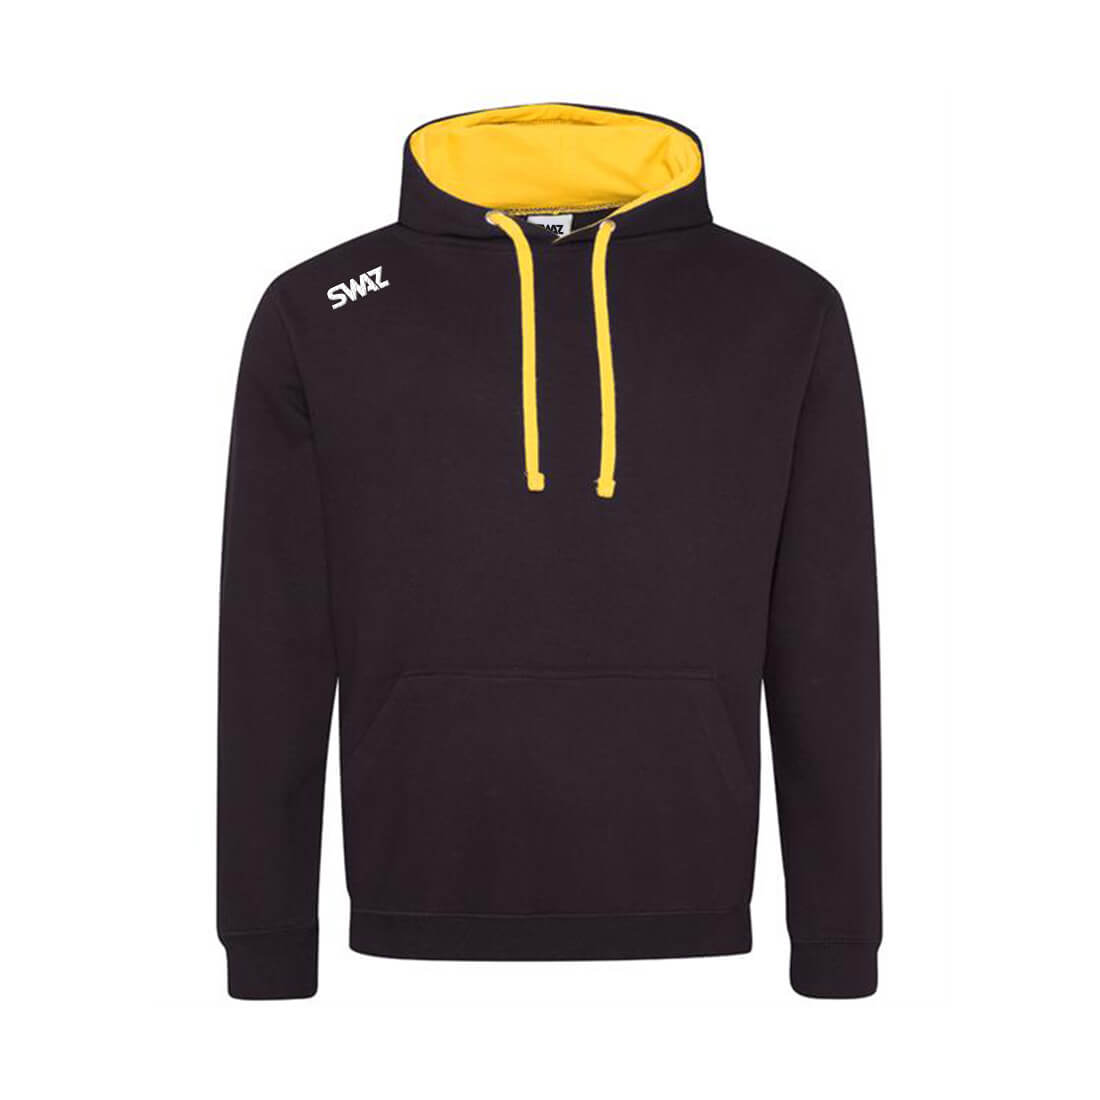 League Football Hoody | Football Training Kit and Teamwear – SWAZ